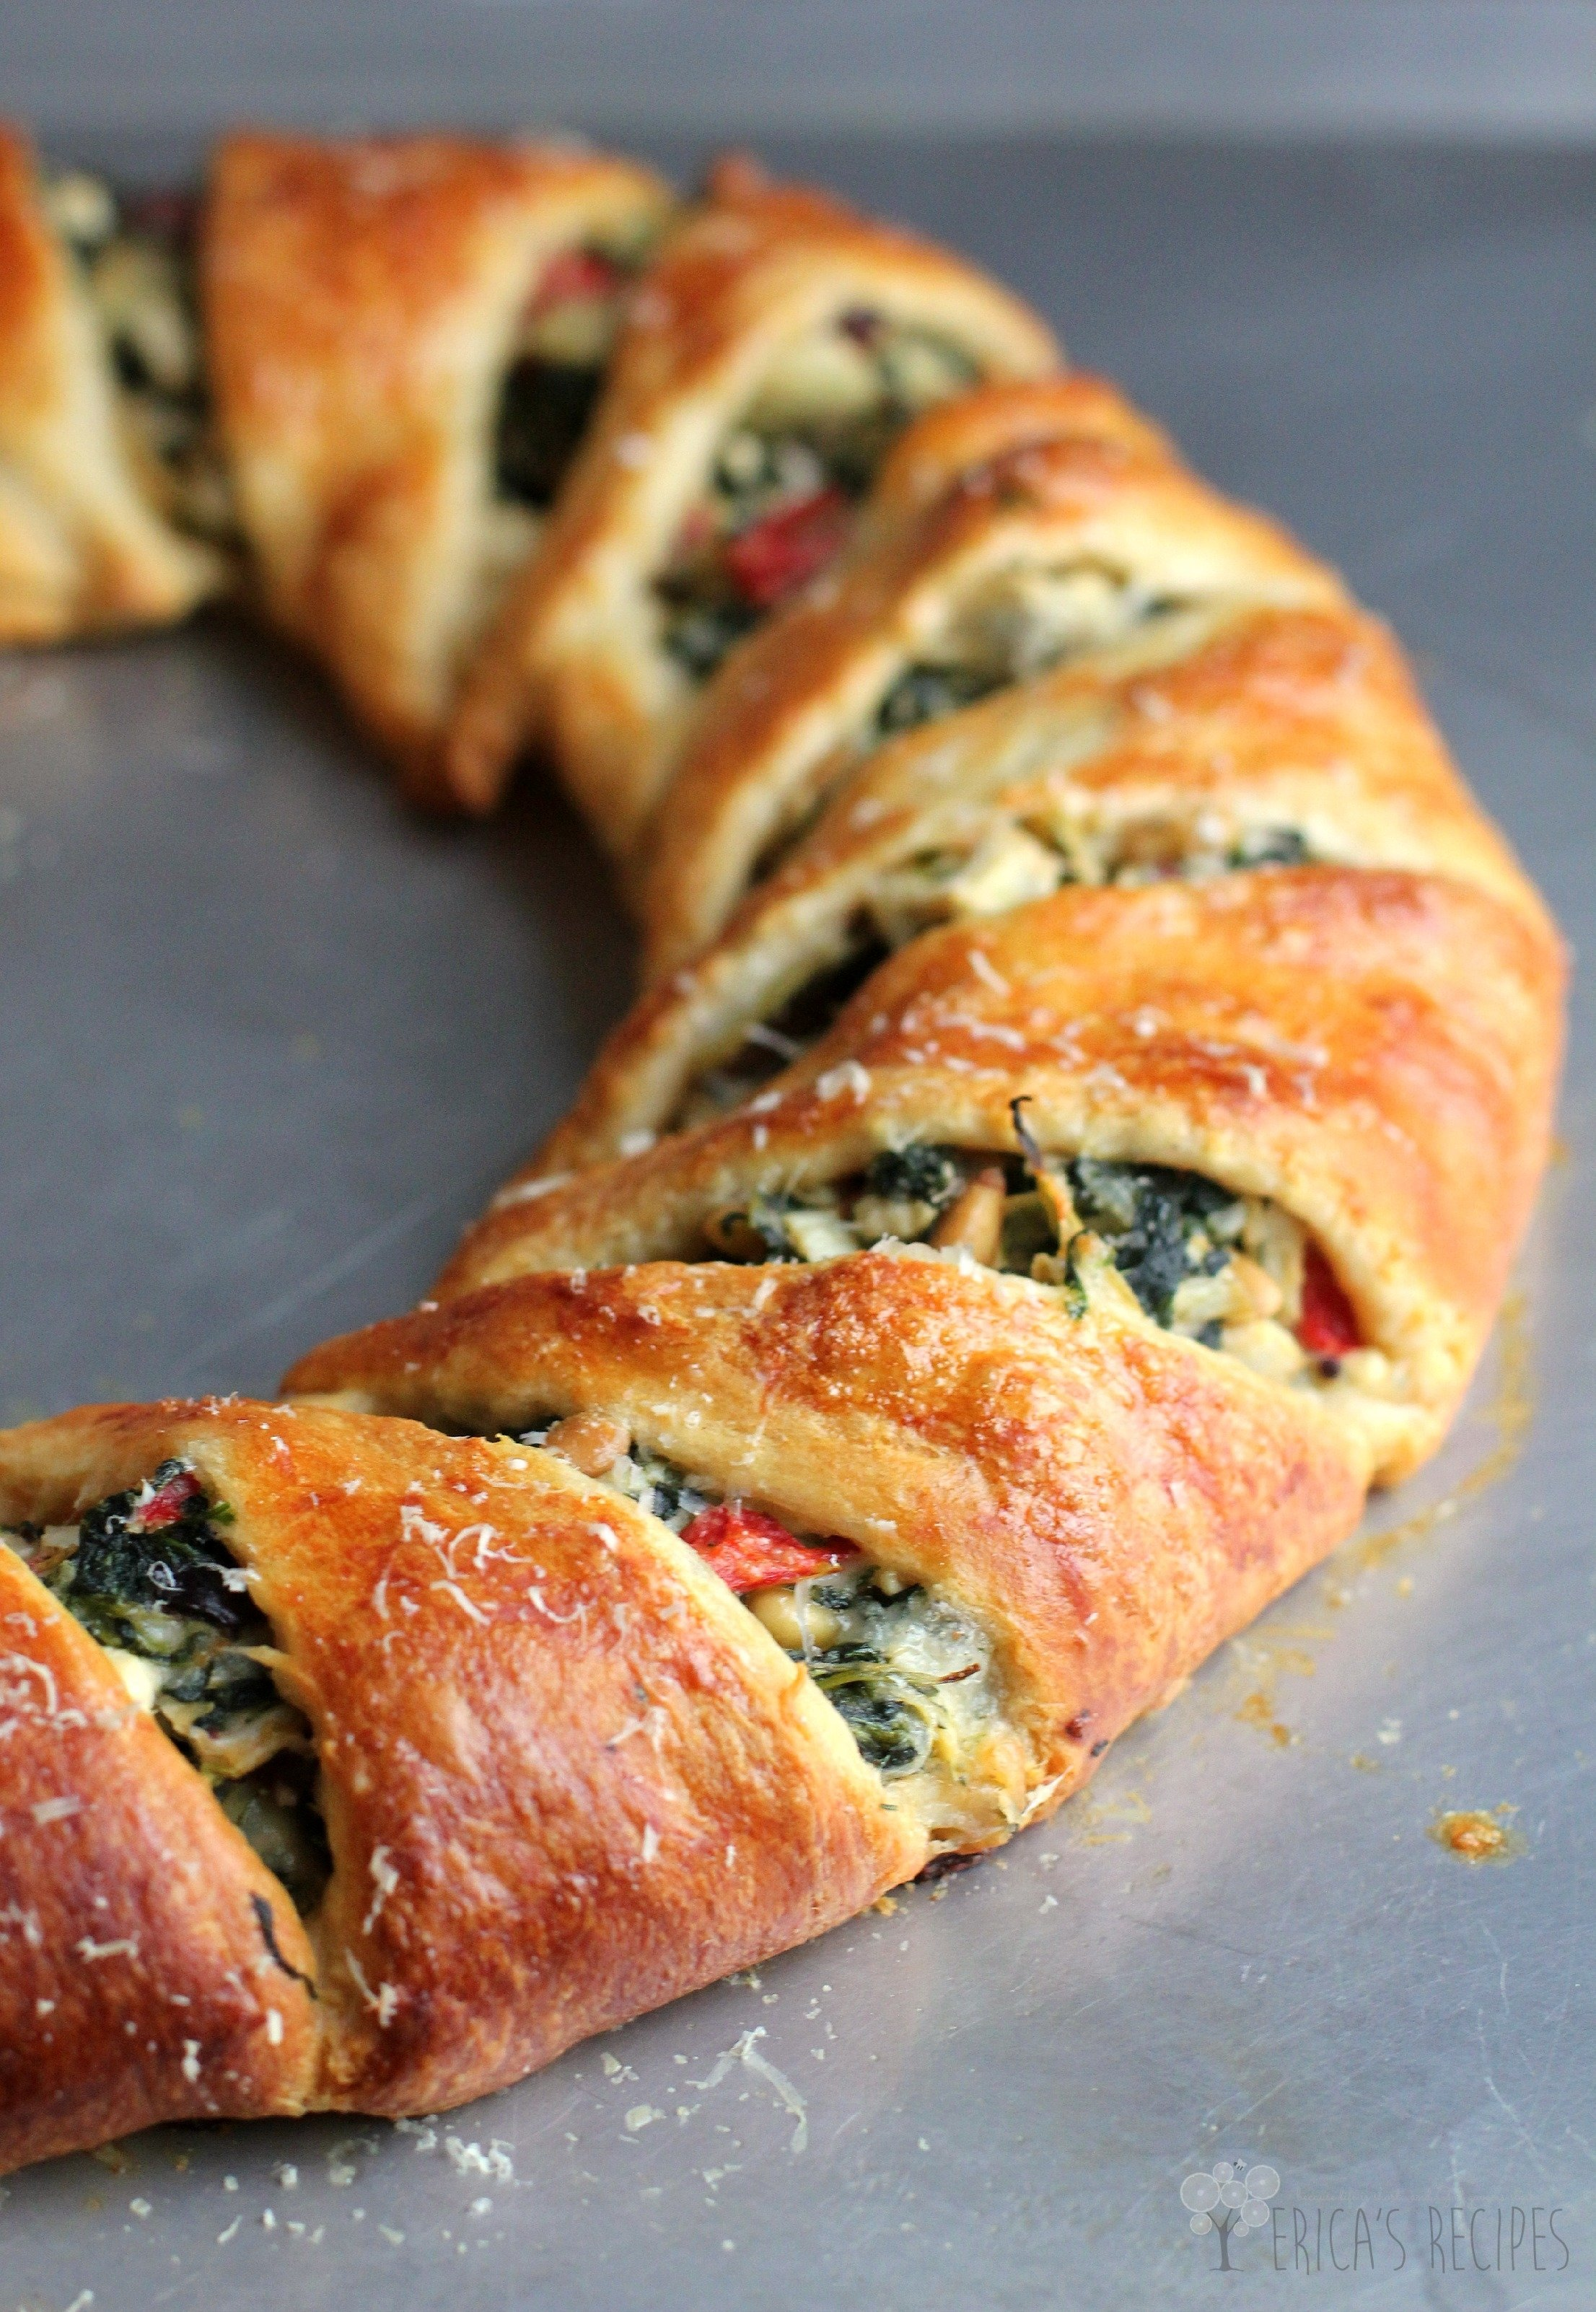 10 Cute Potluck Lunch Ideas For Work mediterranean crescent ring ericas recipes 1 2021